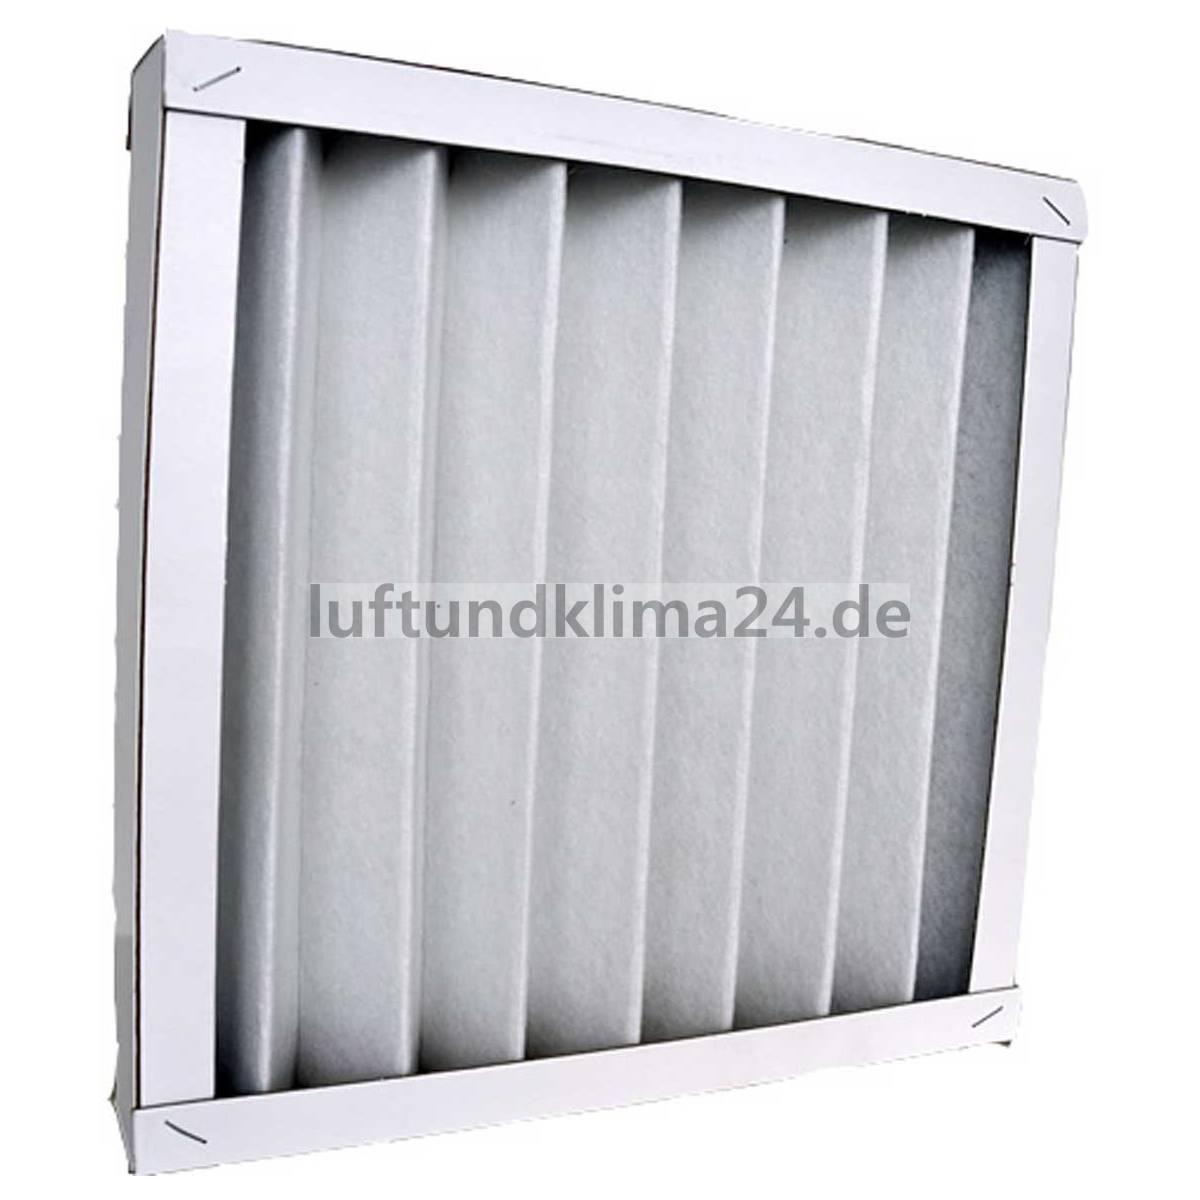 Z-Line G4 Filter 592 x 490 x 48